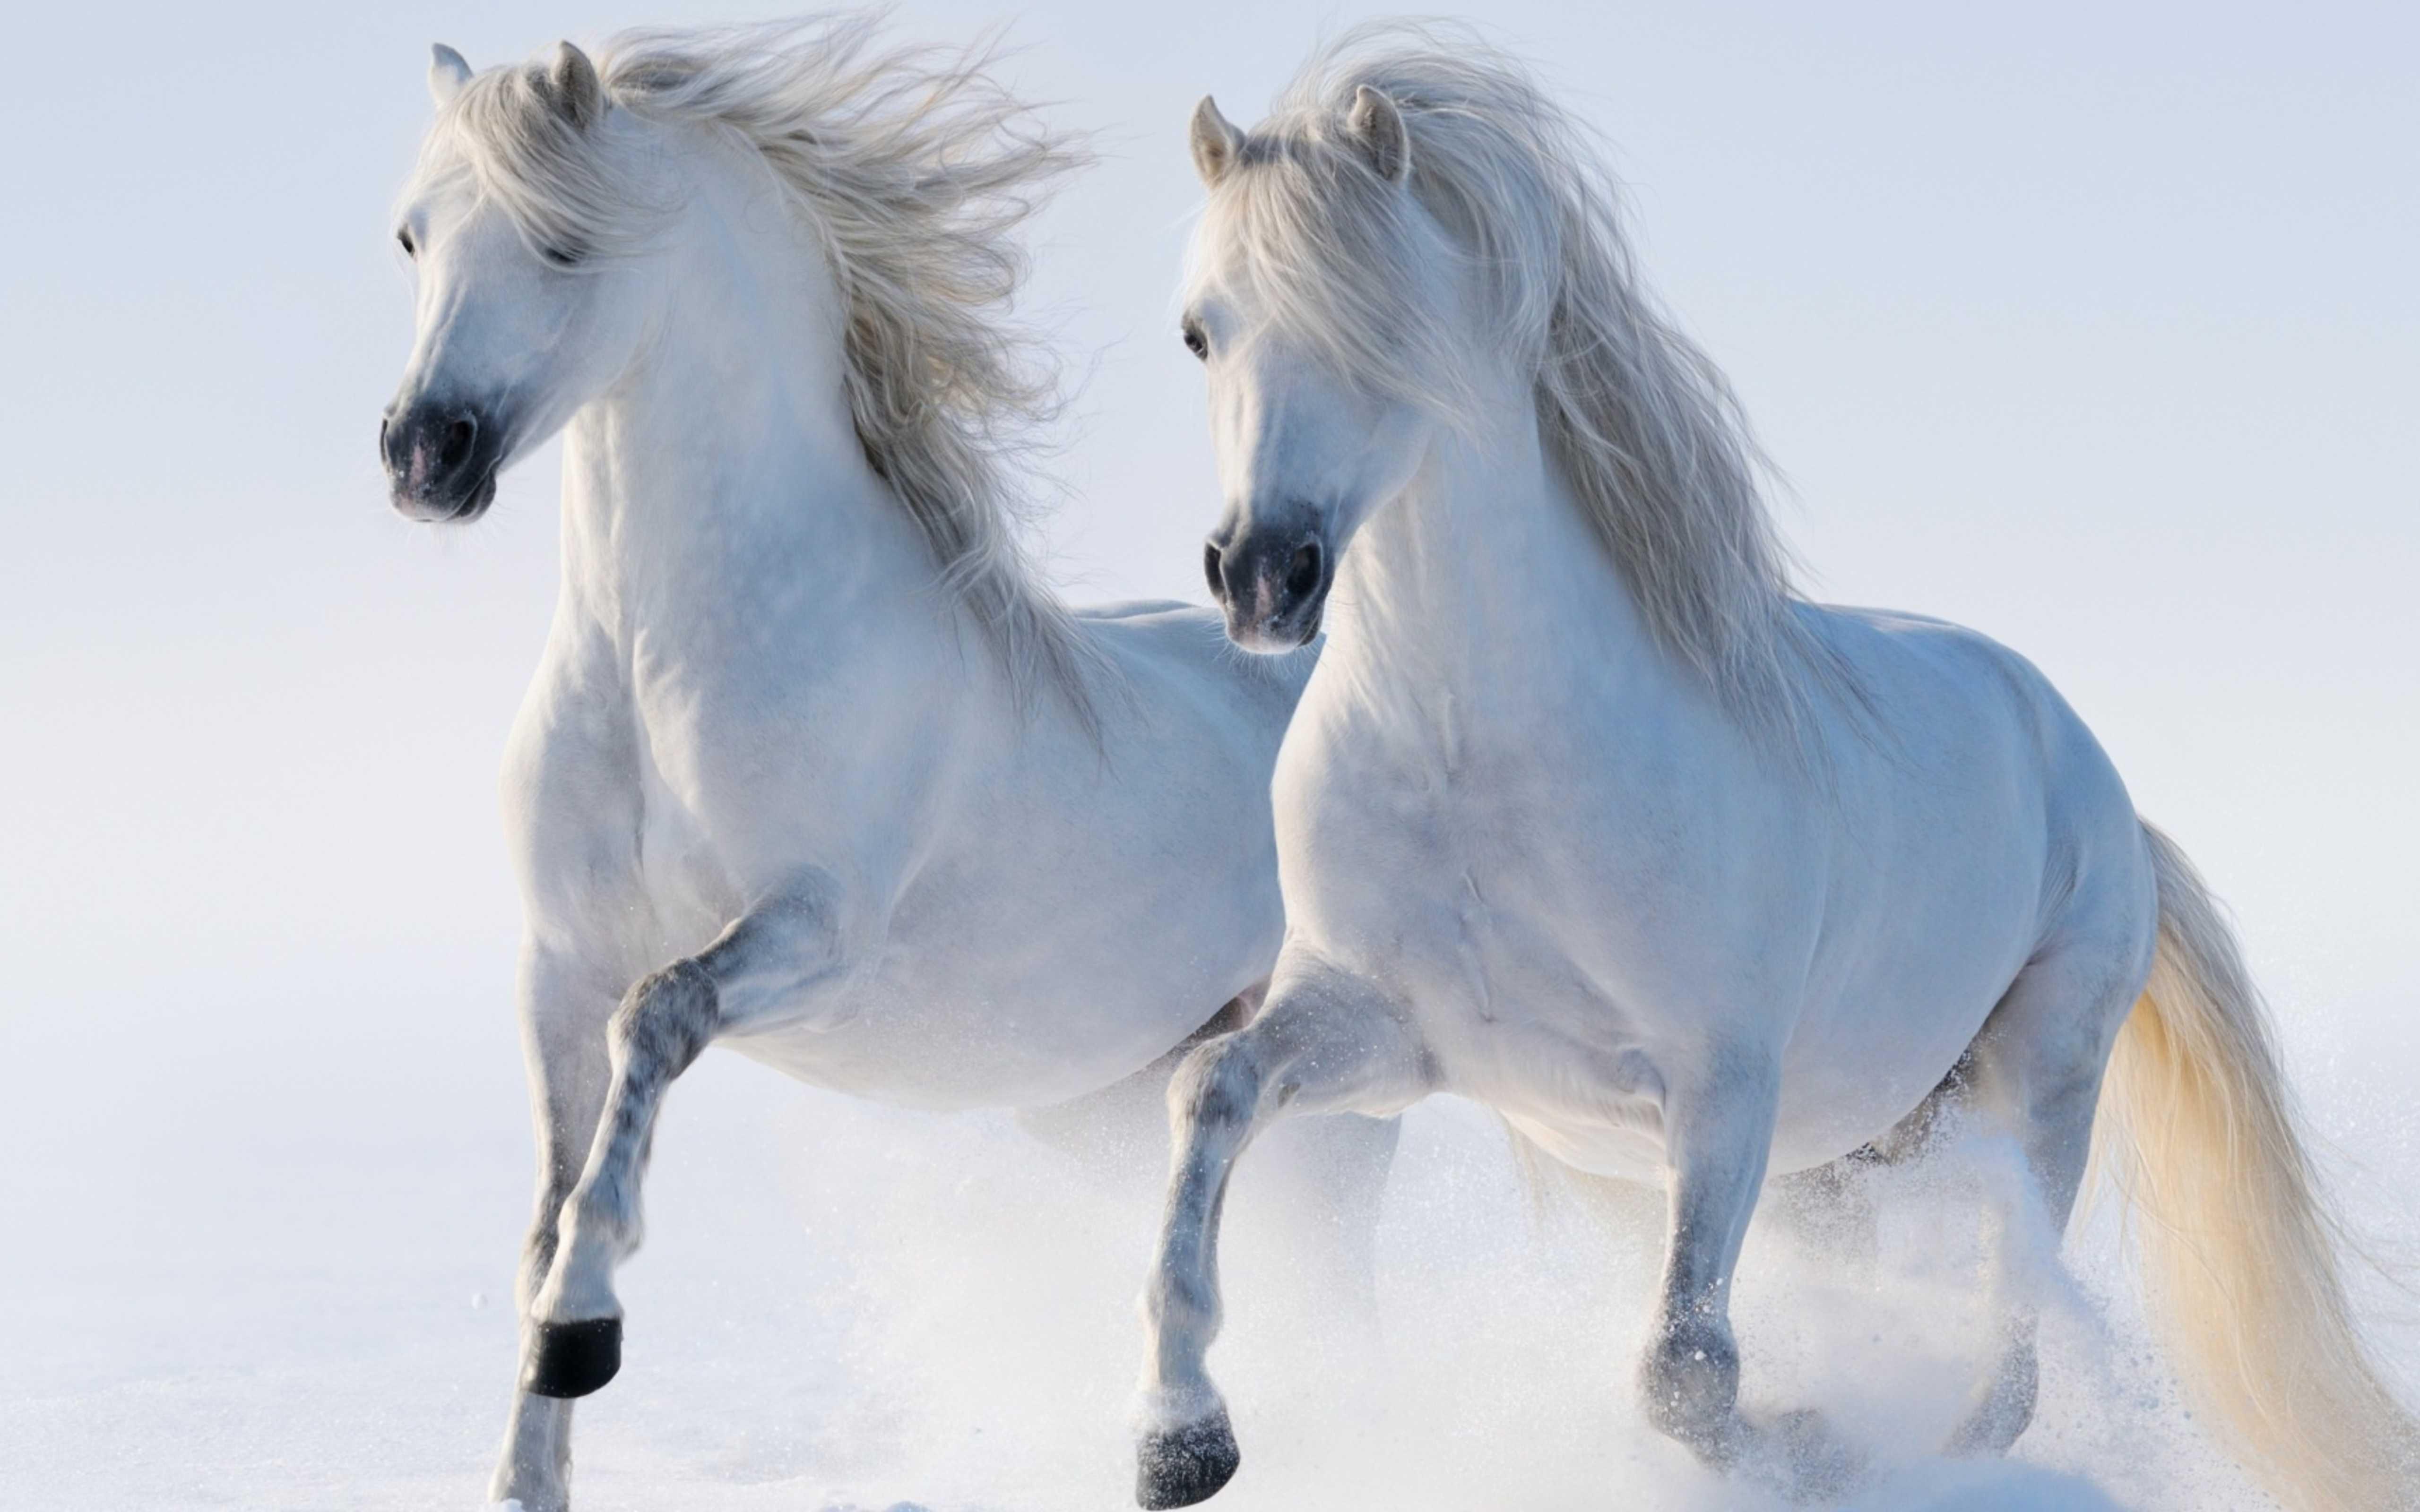 snow wallpaper,horse,mane,stallion,animal figure,mare